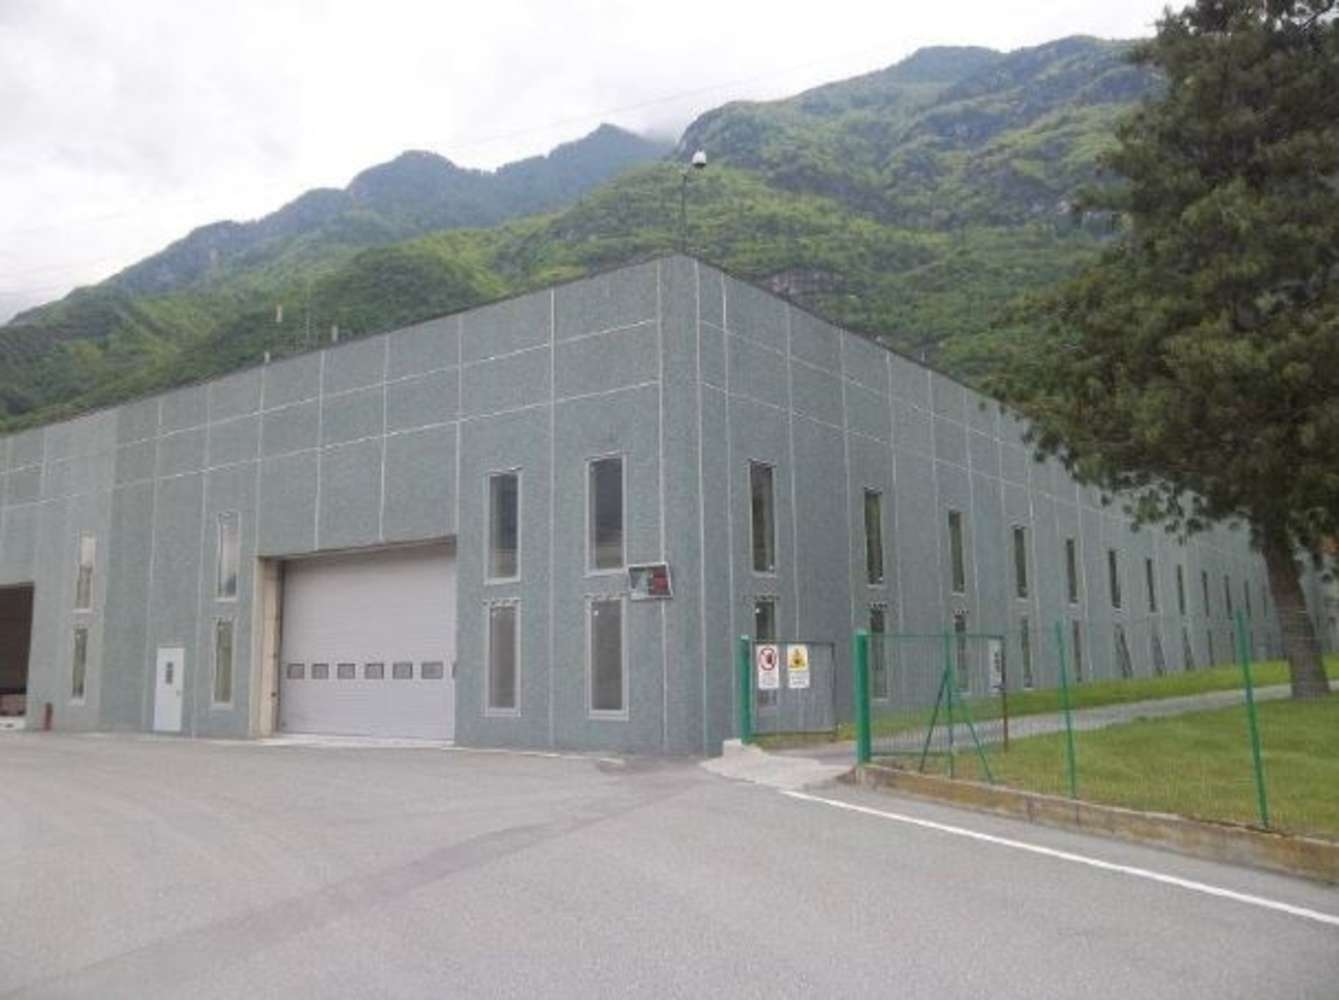 Magazzini industriali e logistici Issogne, 11020 - Capannoni logistici e uffici Aosta - 10033597